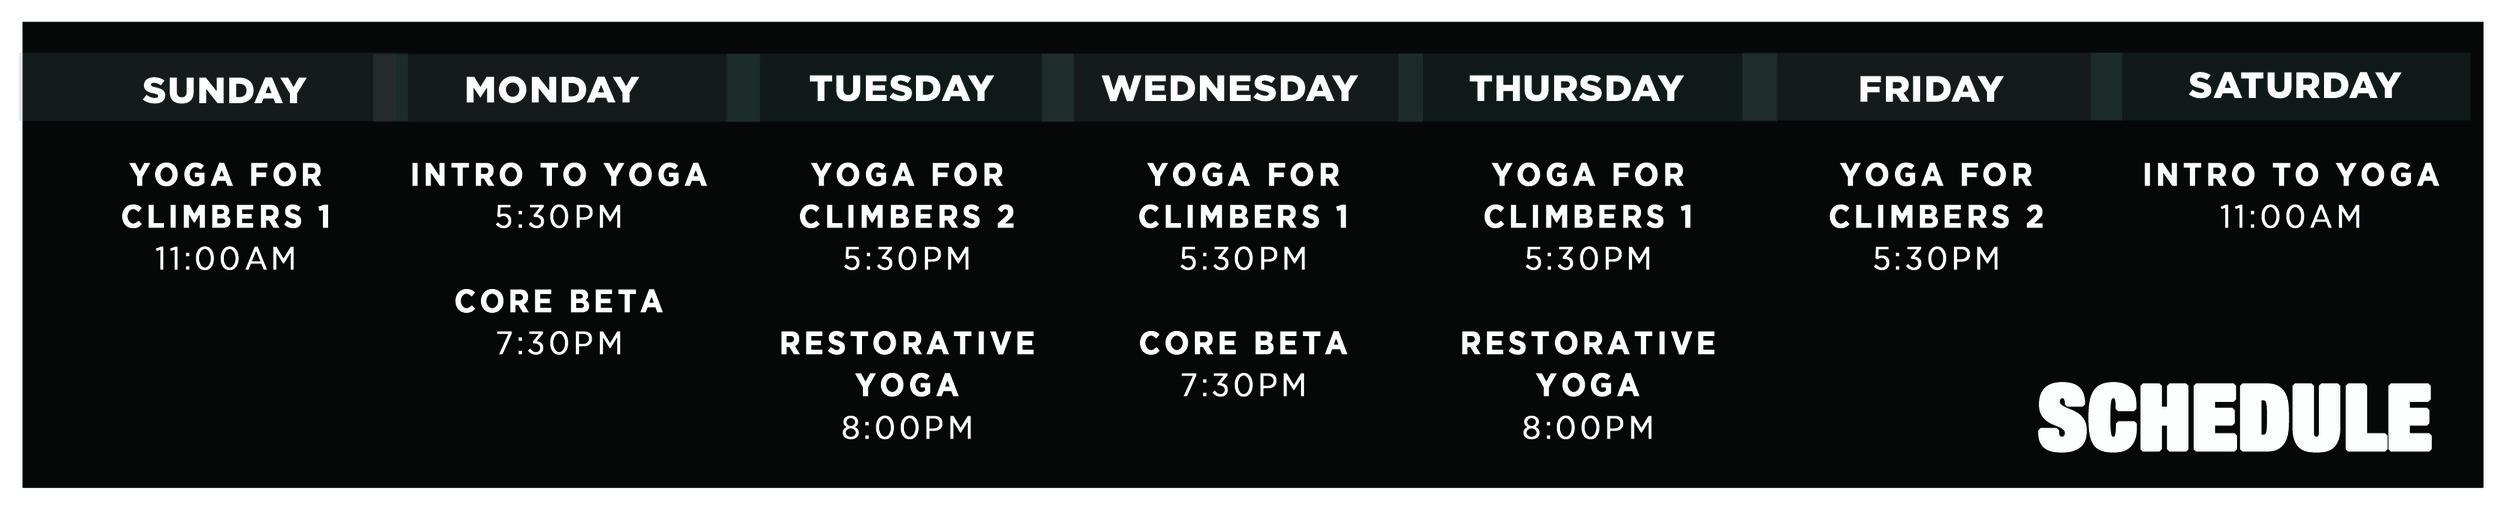 Yoga Calendar 6_19.jpg